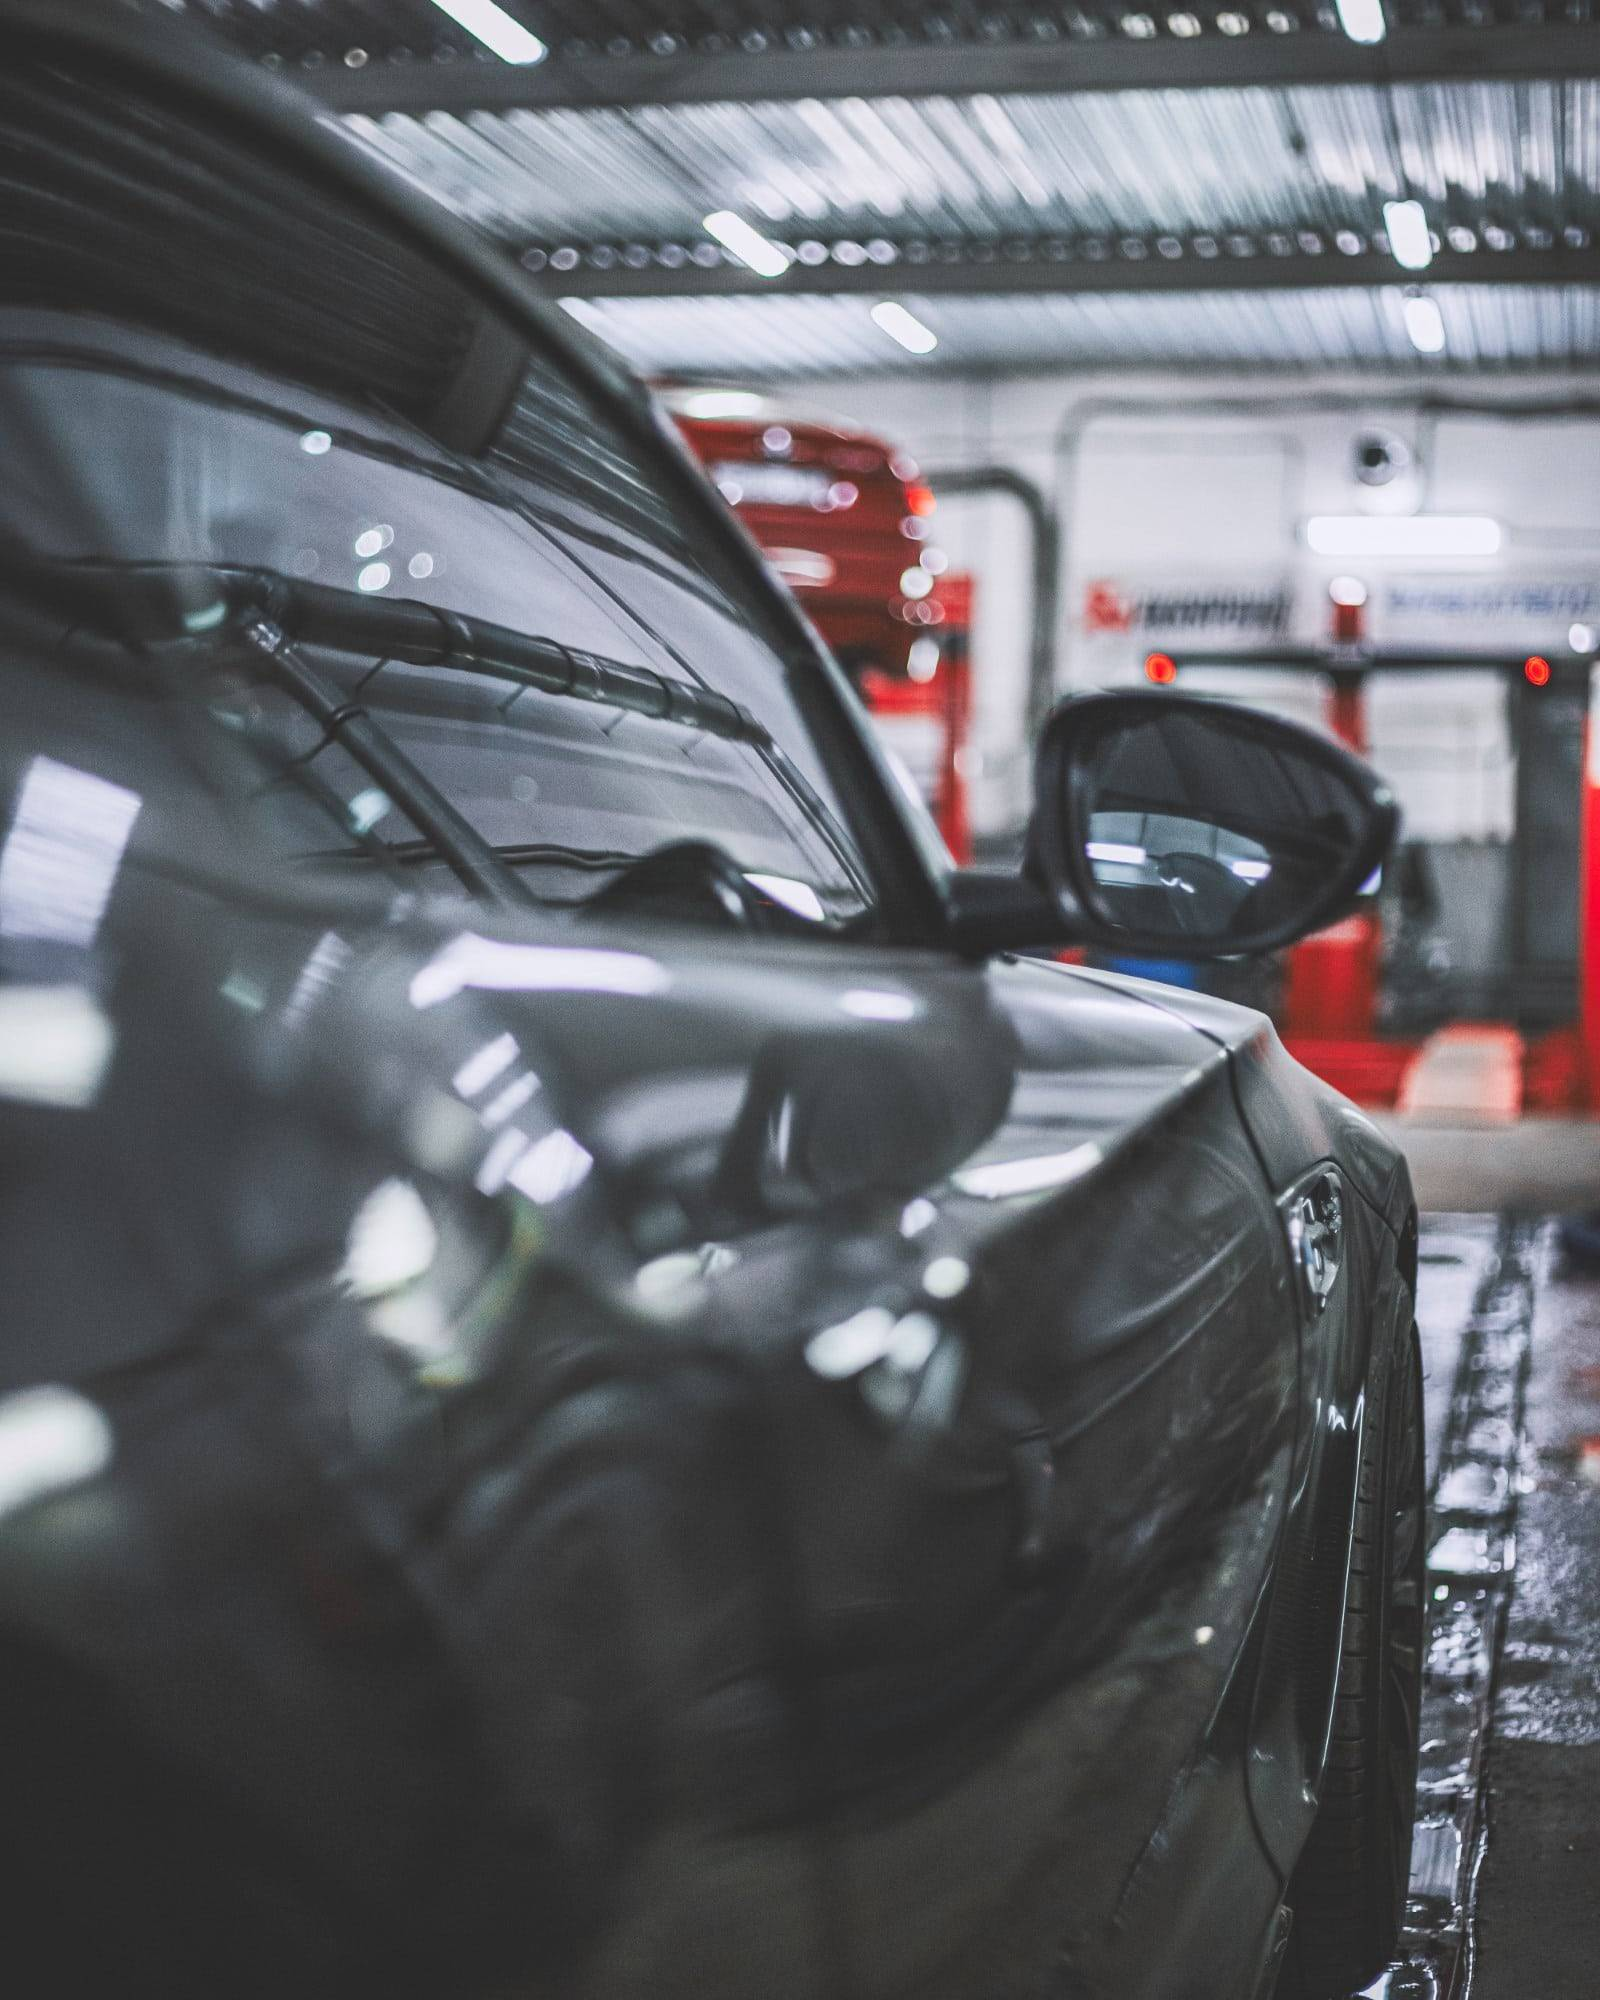 Техобслуживание BMW Z4 30i Е89 и подготовка к сезону 3